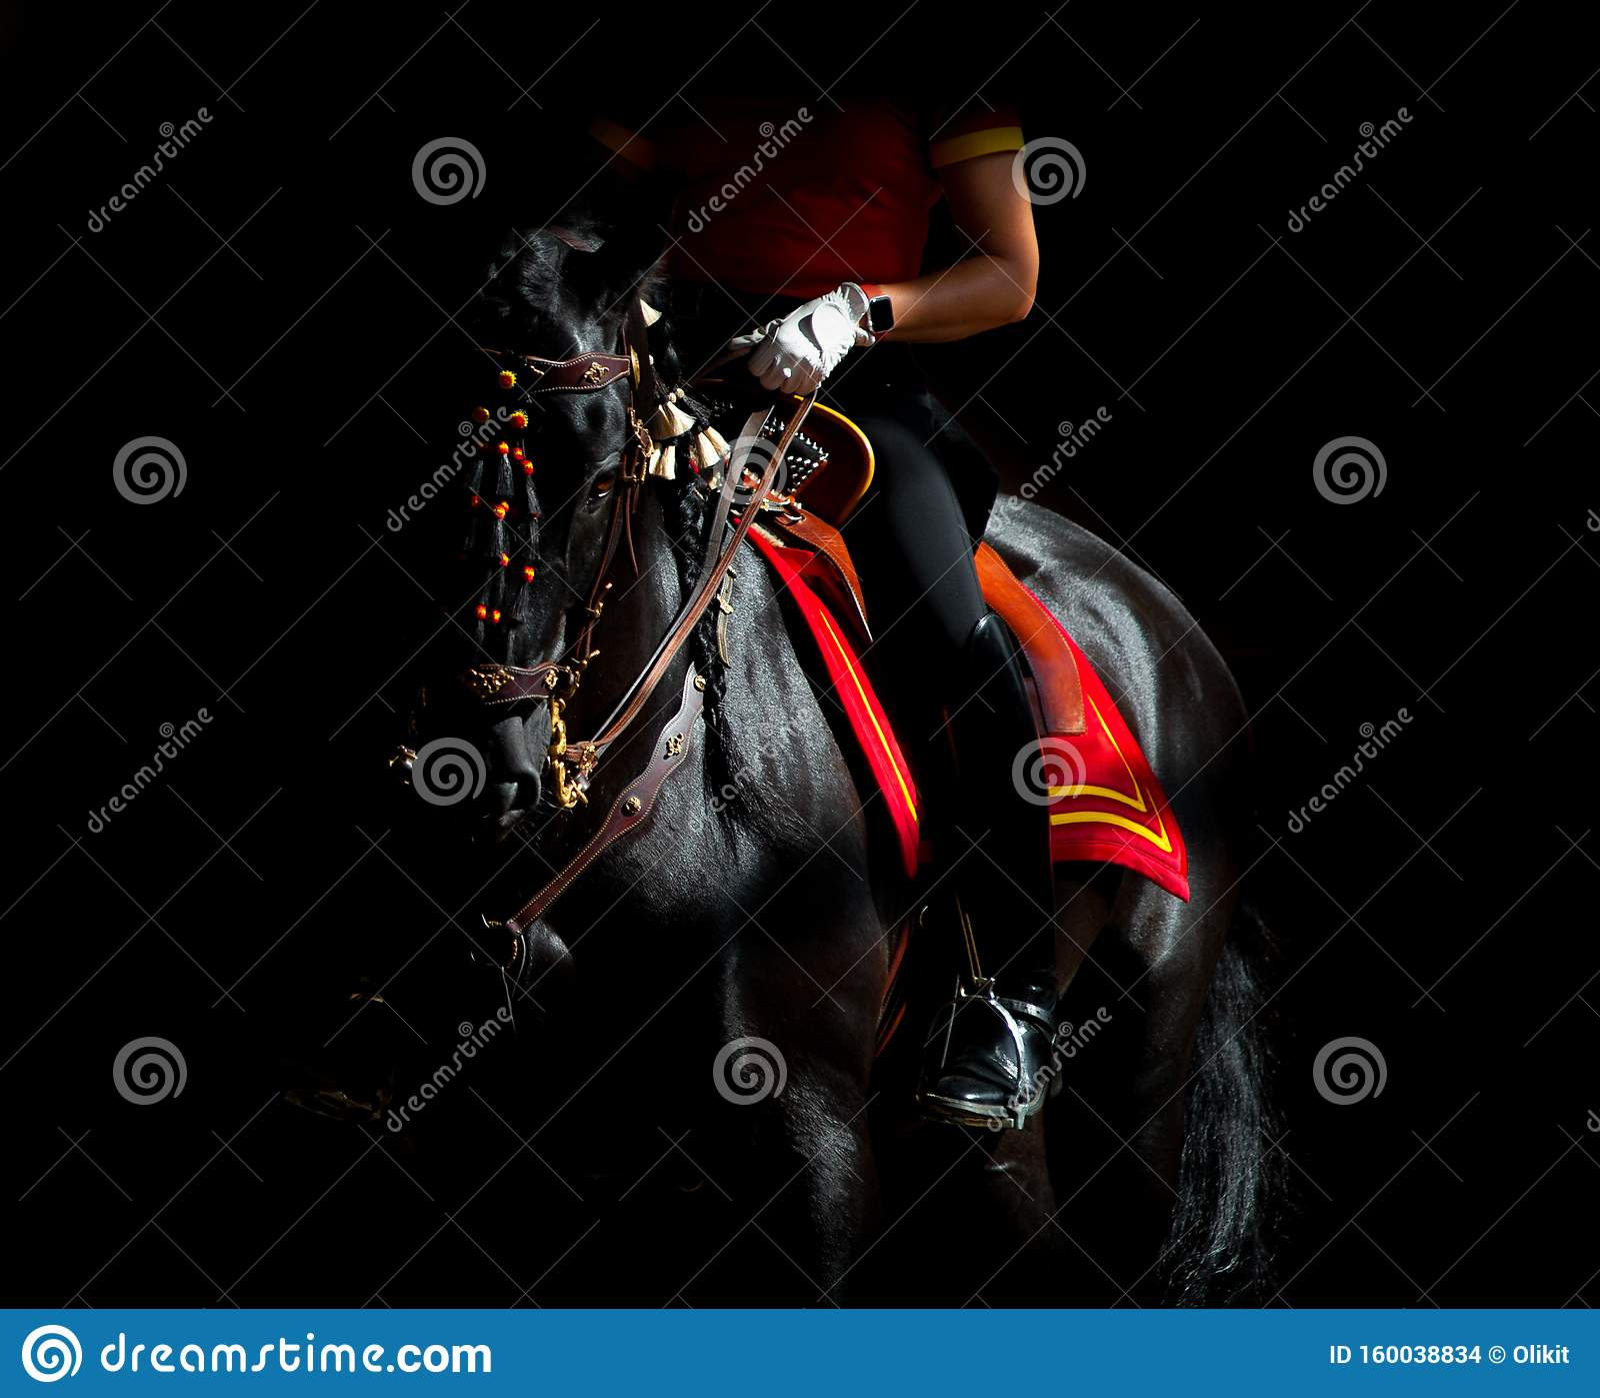 Black andalusian horse on dark background under the saddle